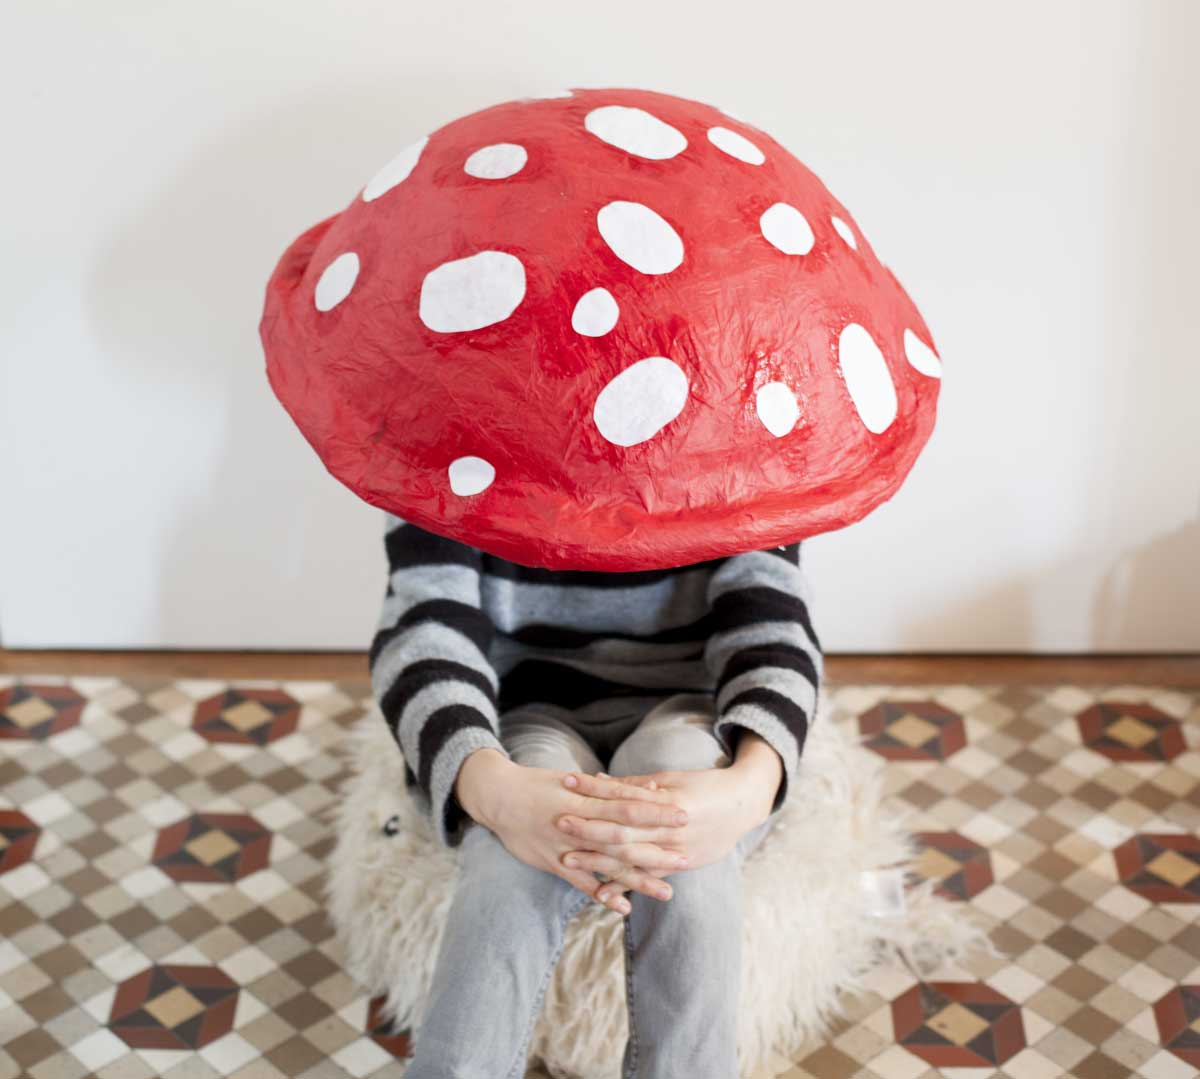 carneval-karneval-carnestoltes-pilz-verkleidung-disfraz-seta-mushroom-costume-selfmade-diy